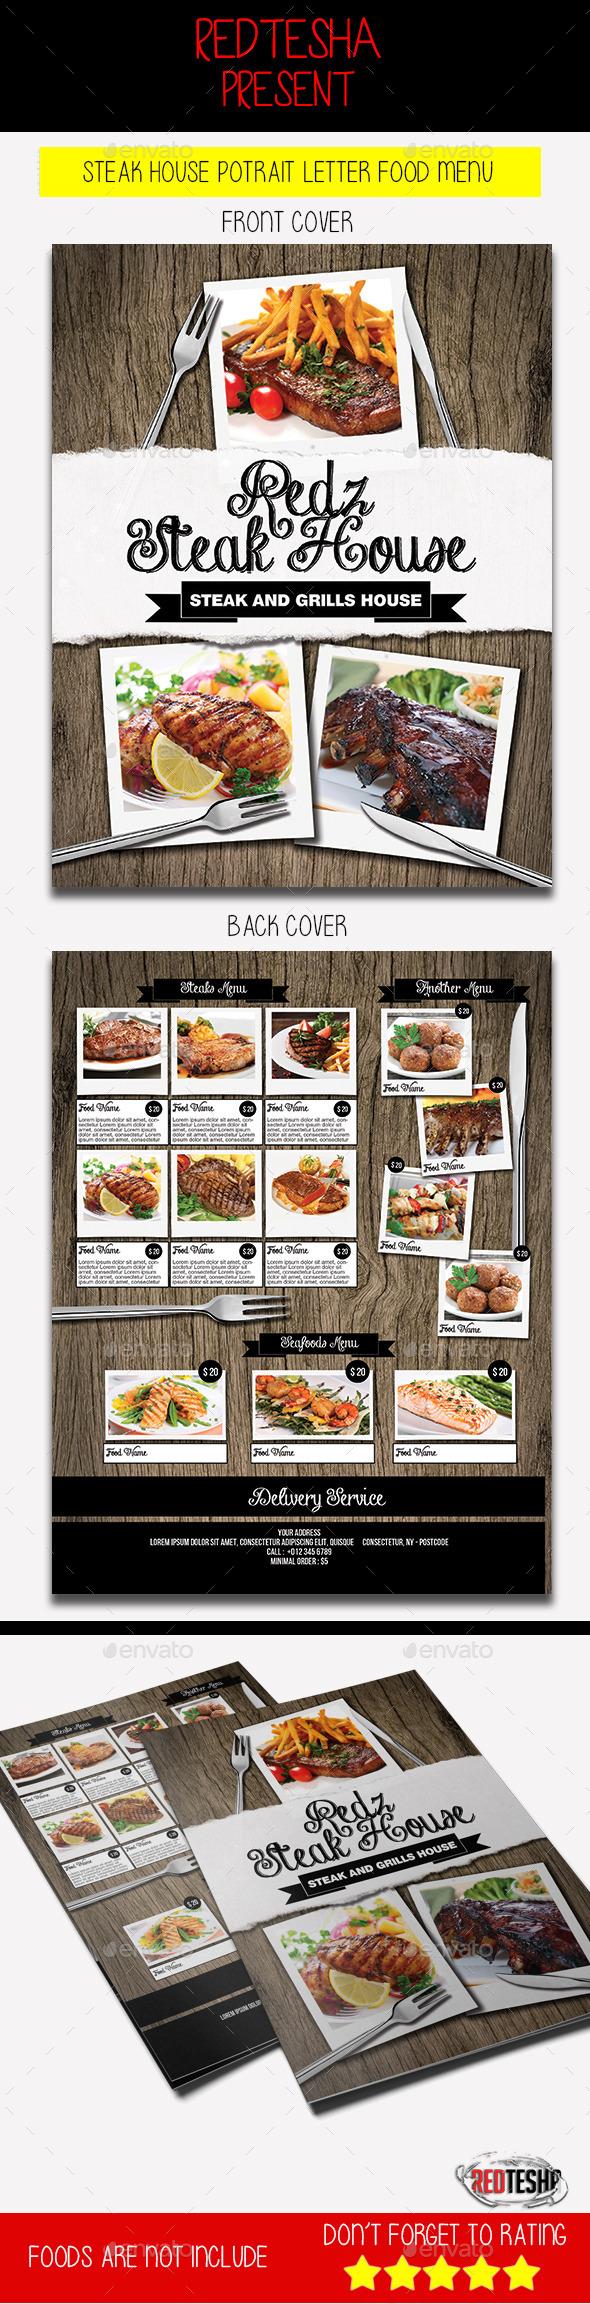 Steak House Potrait Letter Food Menu - Food Menus Print Templates